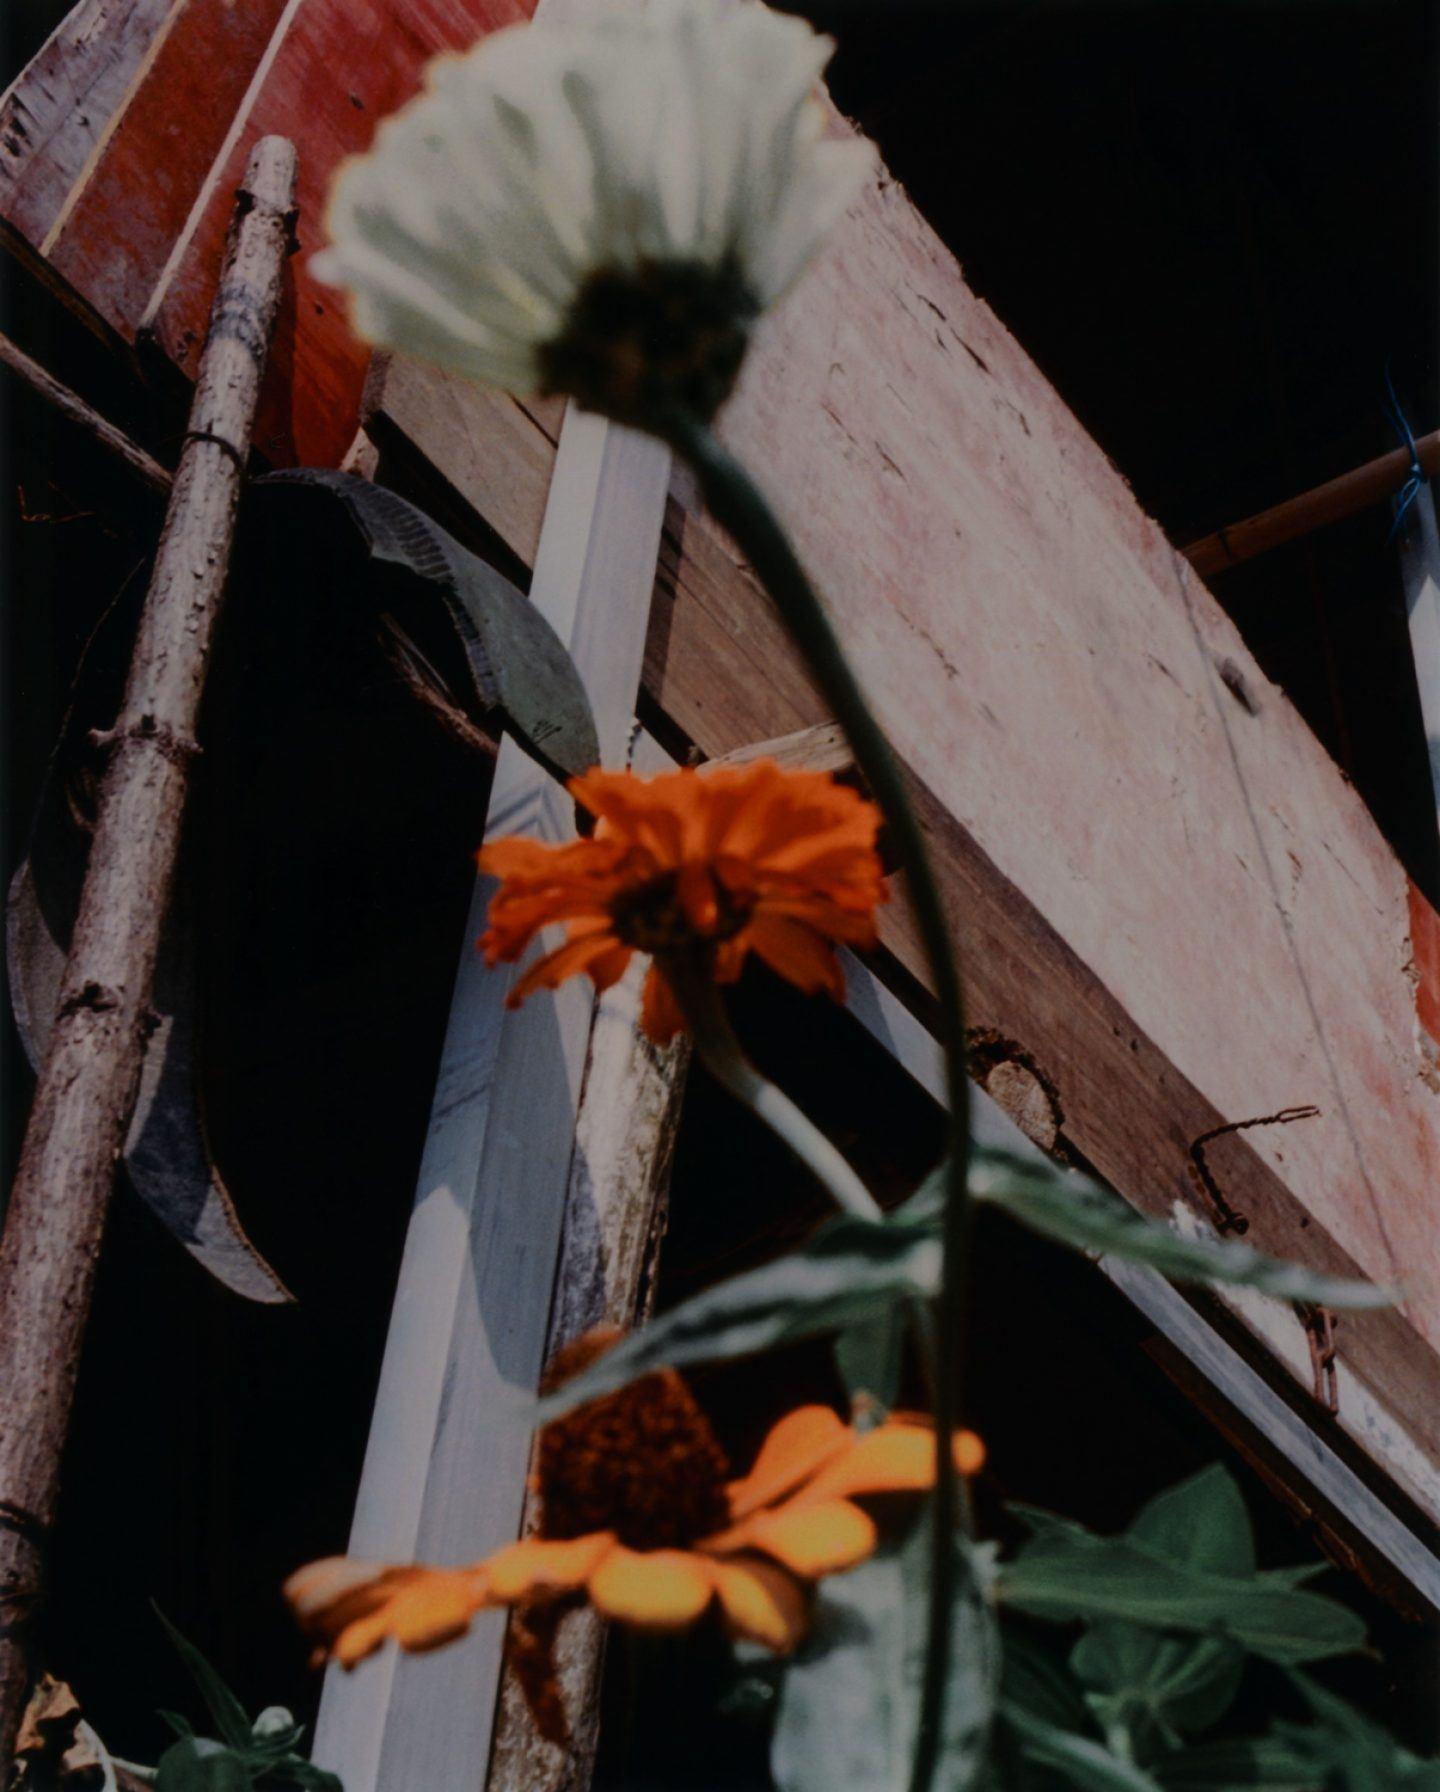 IGNANT-Photography-Jack-Davison-Recent-014